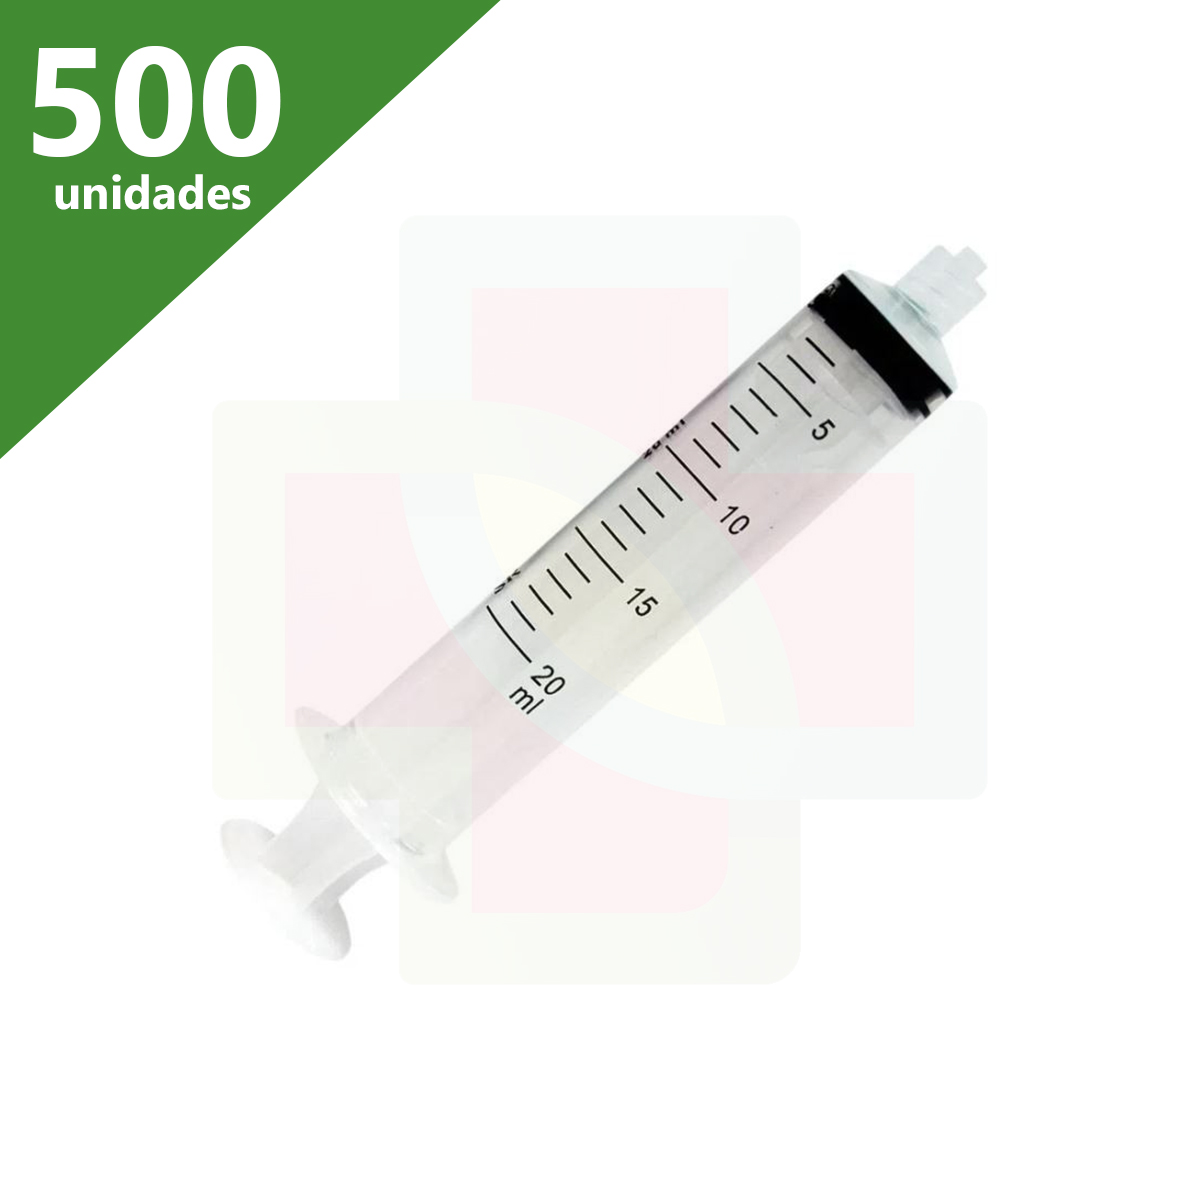 SERINGA DESCARTÁVEL 20 ML C/AG LUER LOCK (C/500) - SR